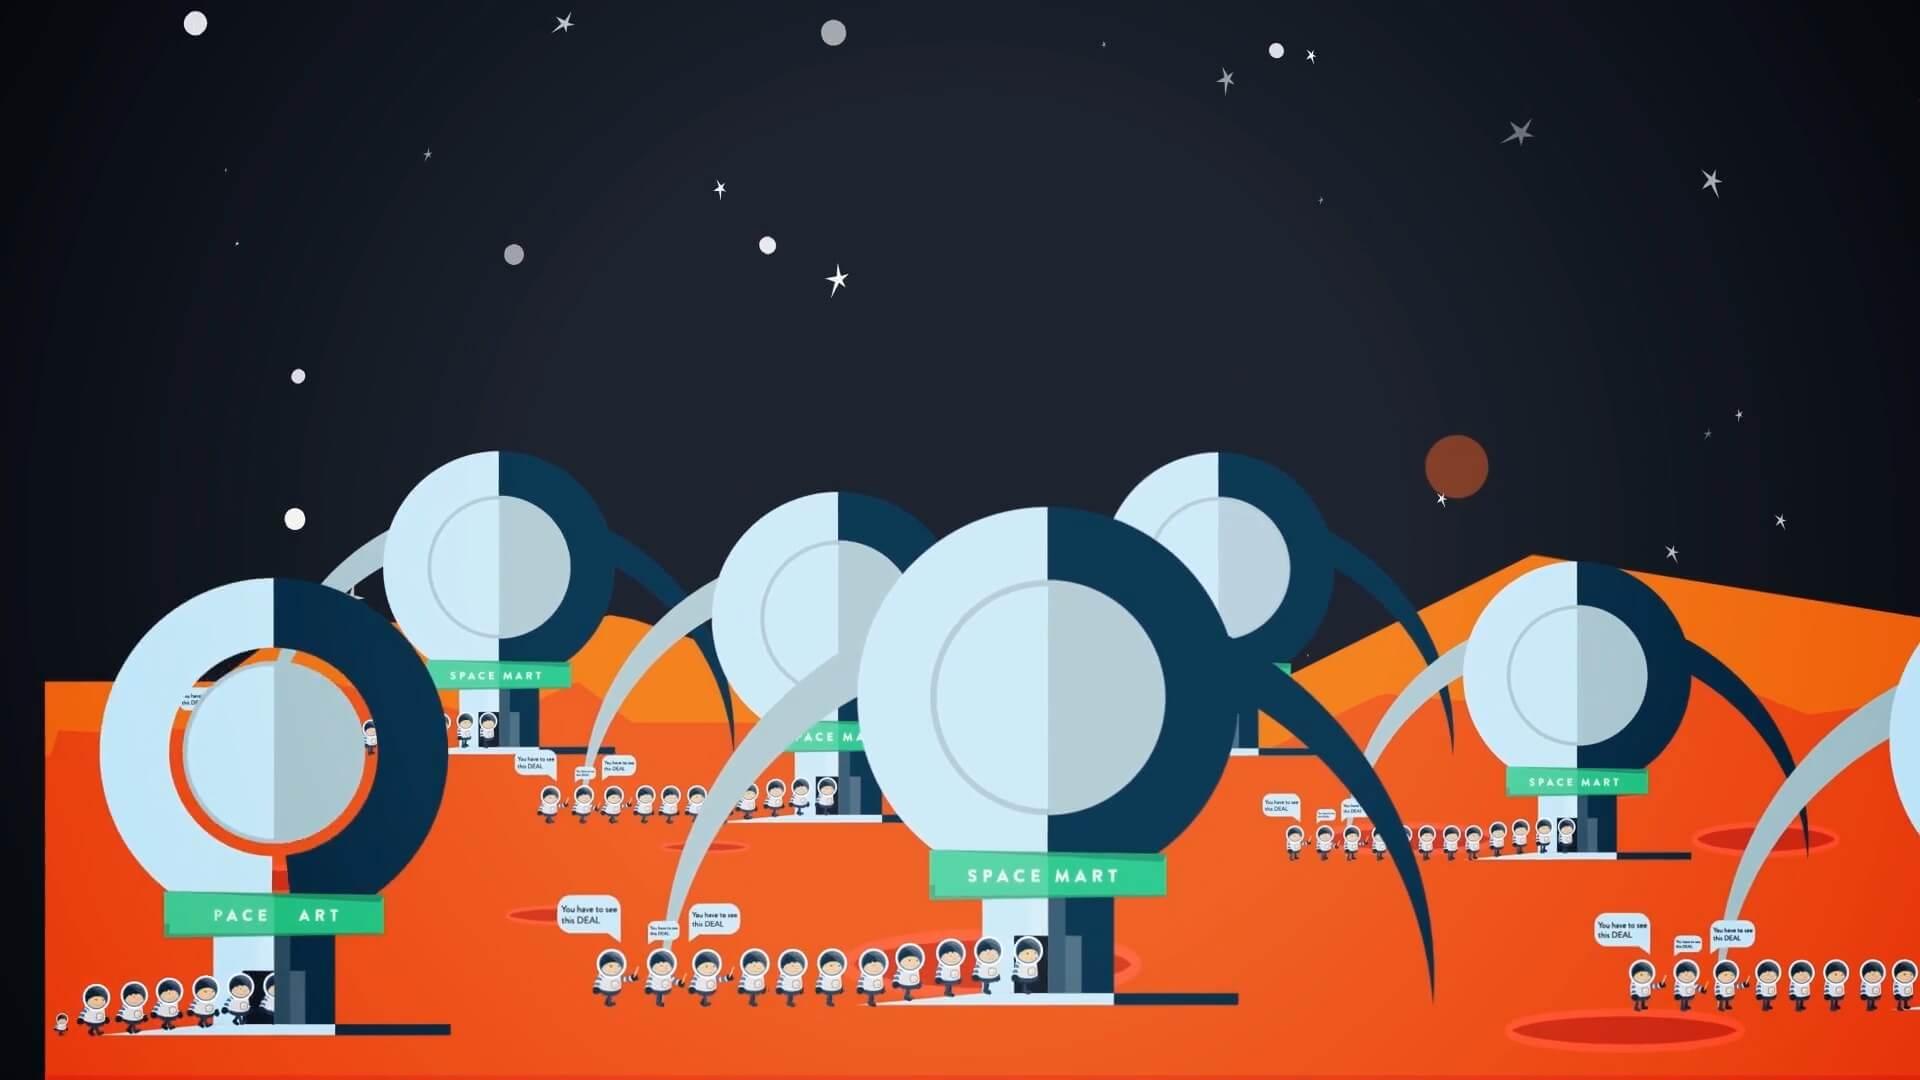 Running Lean space scene